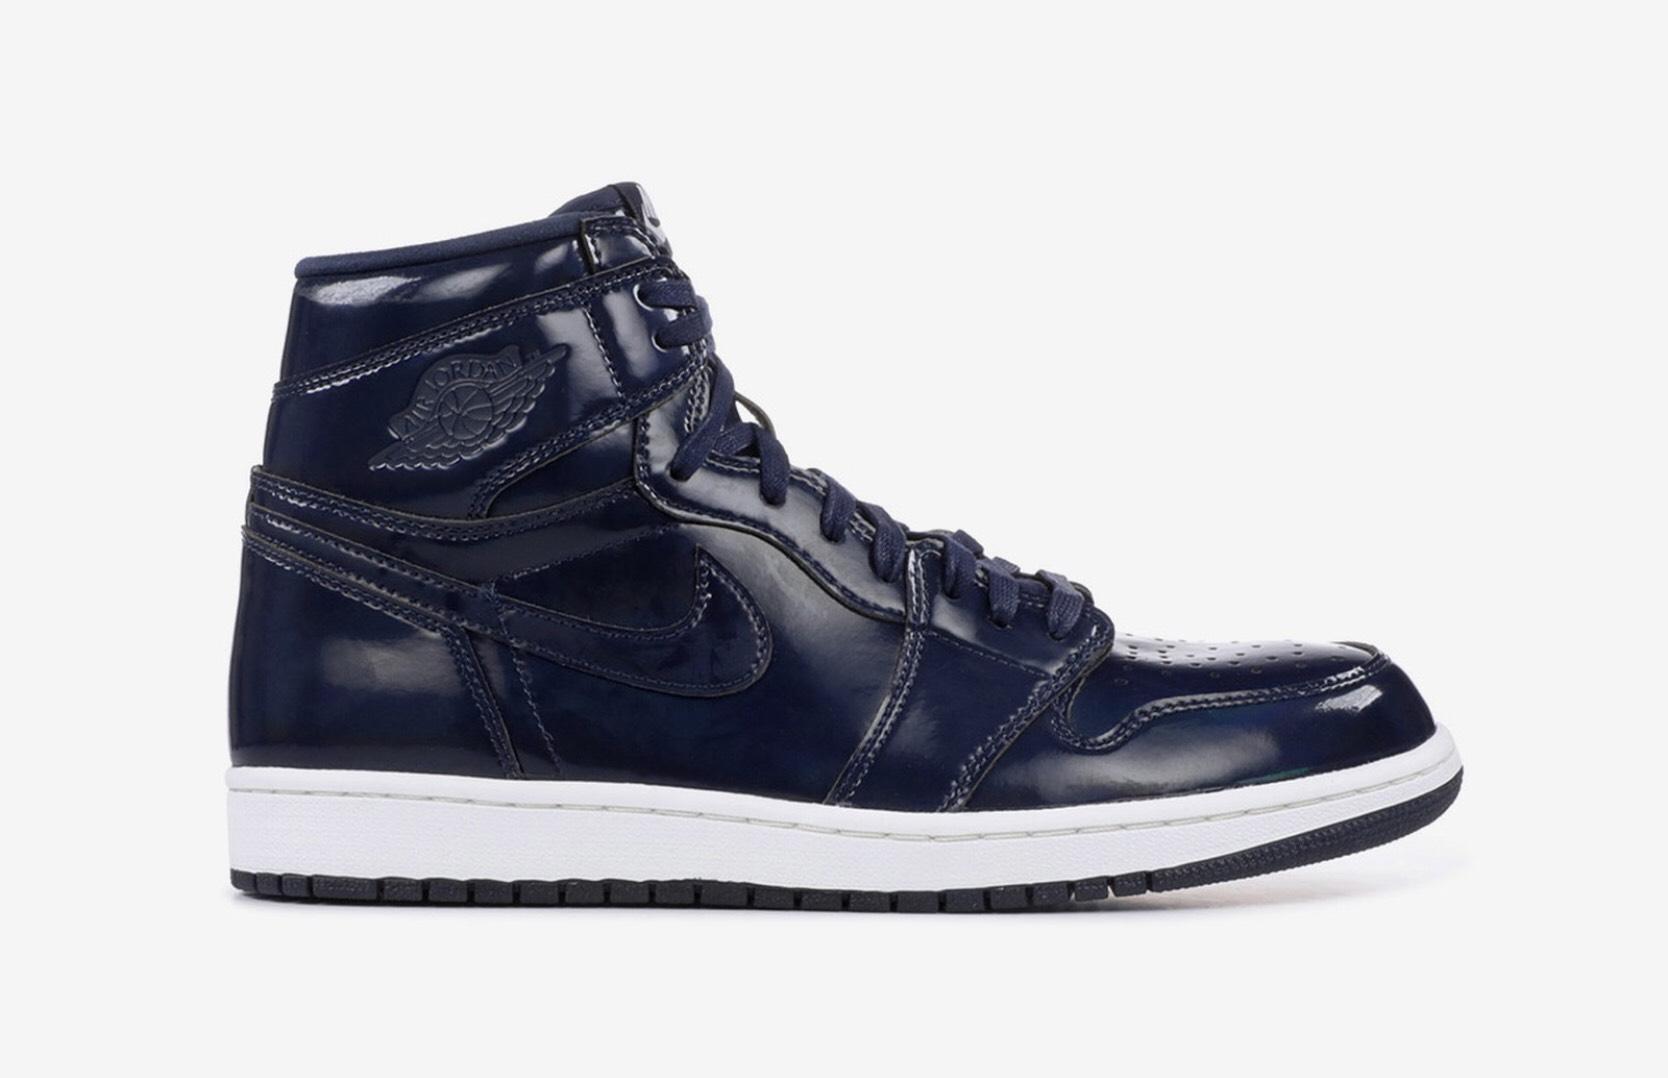 Collab Dover Street Maket x Nike Air Jordan 1